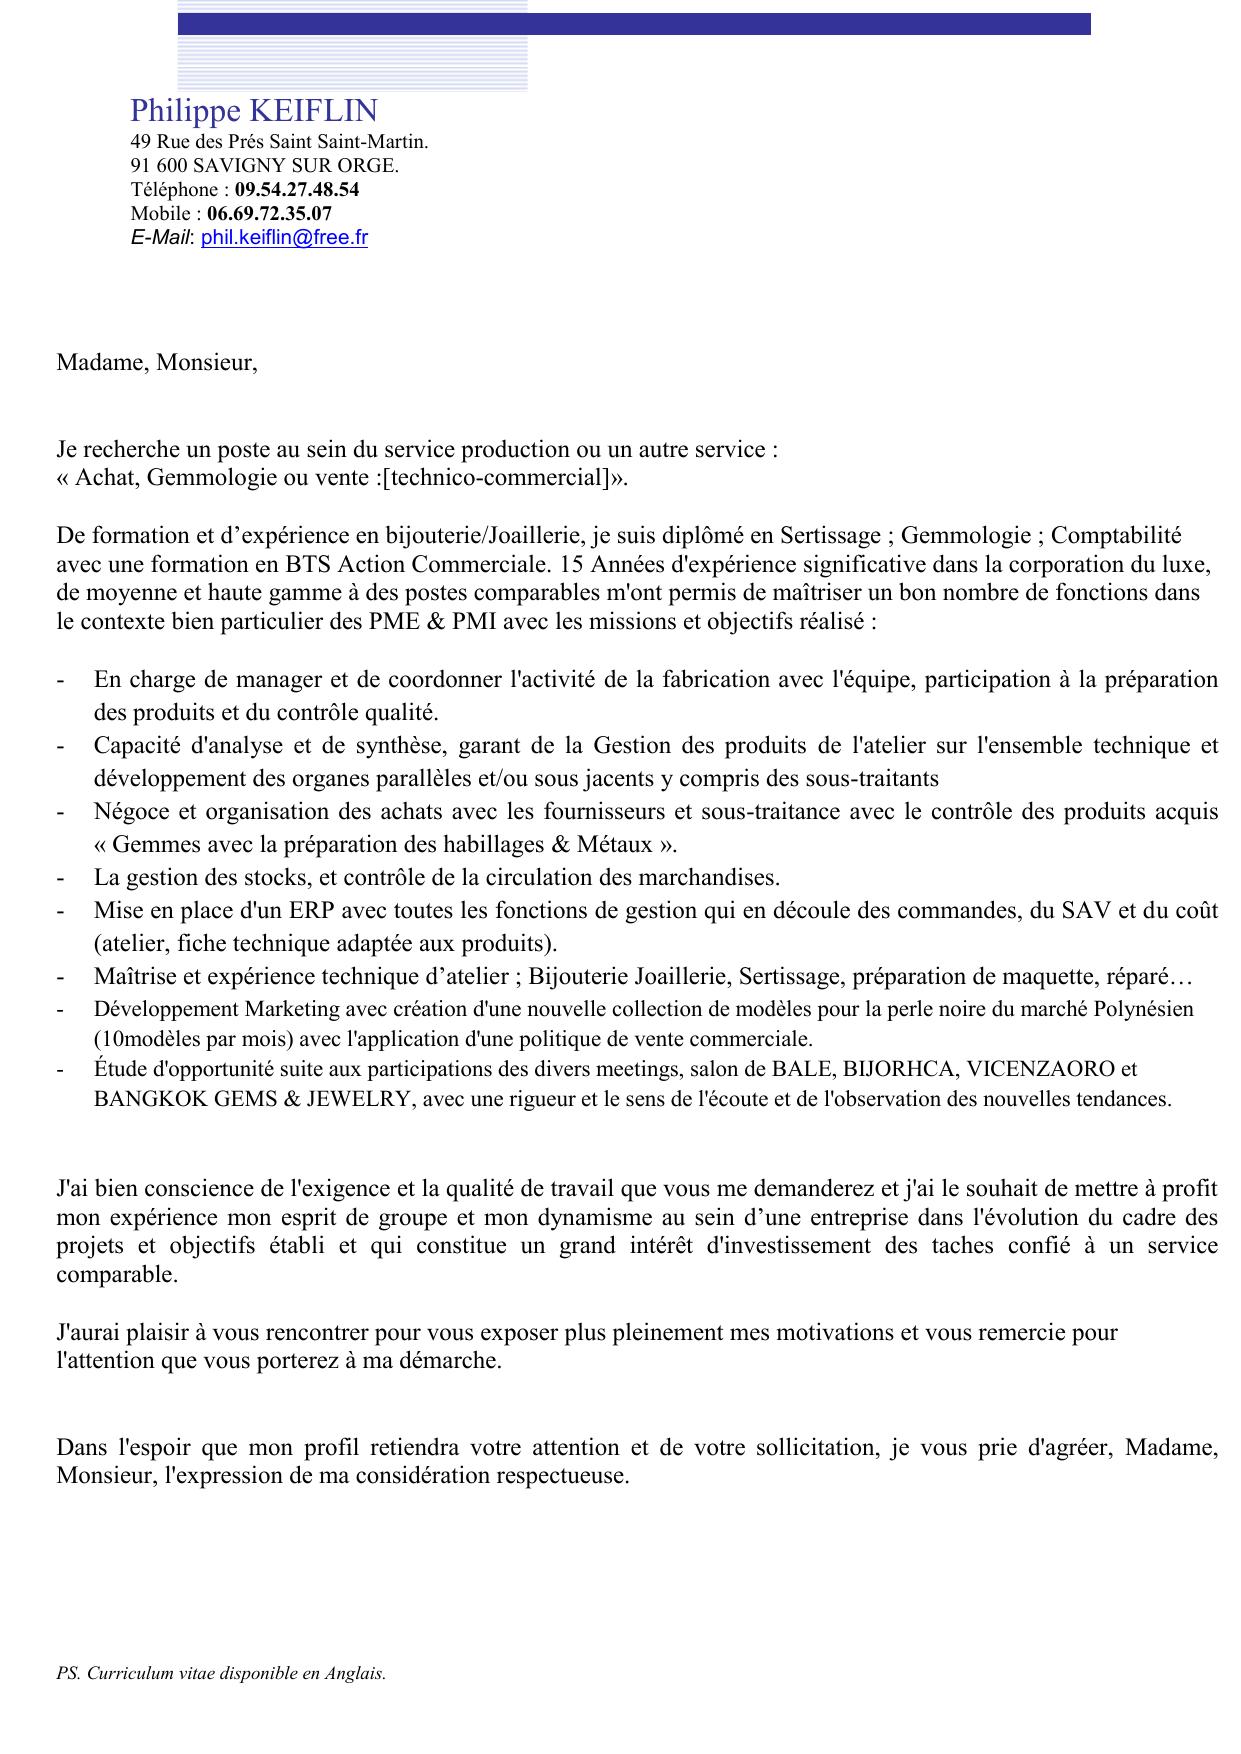 KEIFLIN Philippe   de Philippe KEIFLIN Joaillier